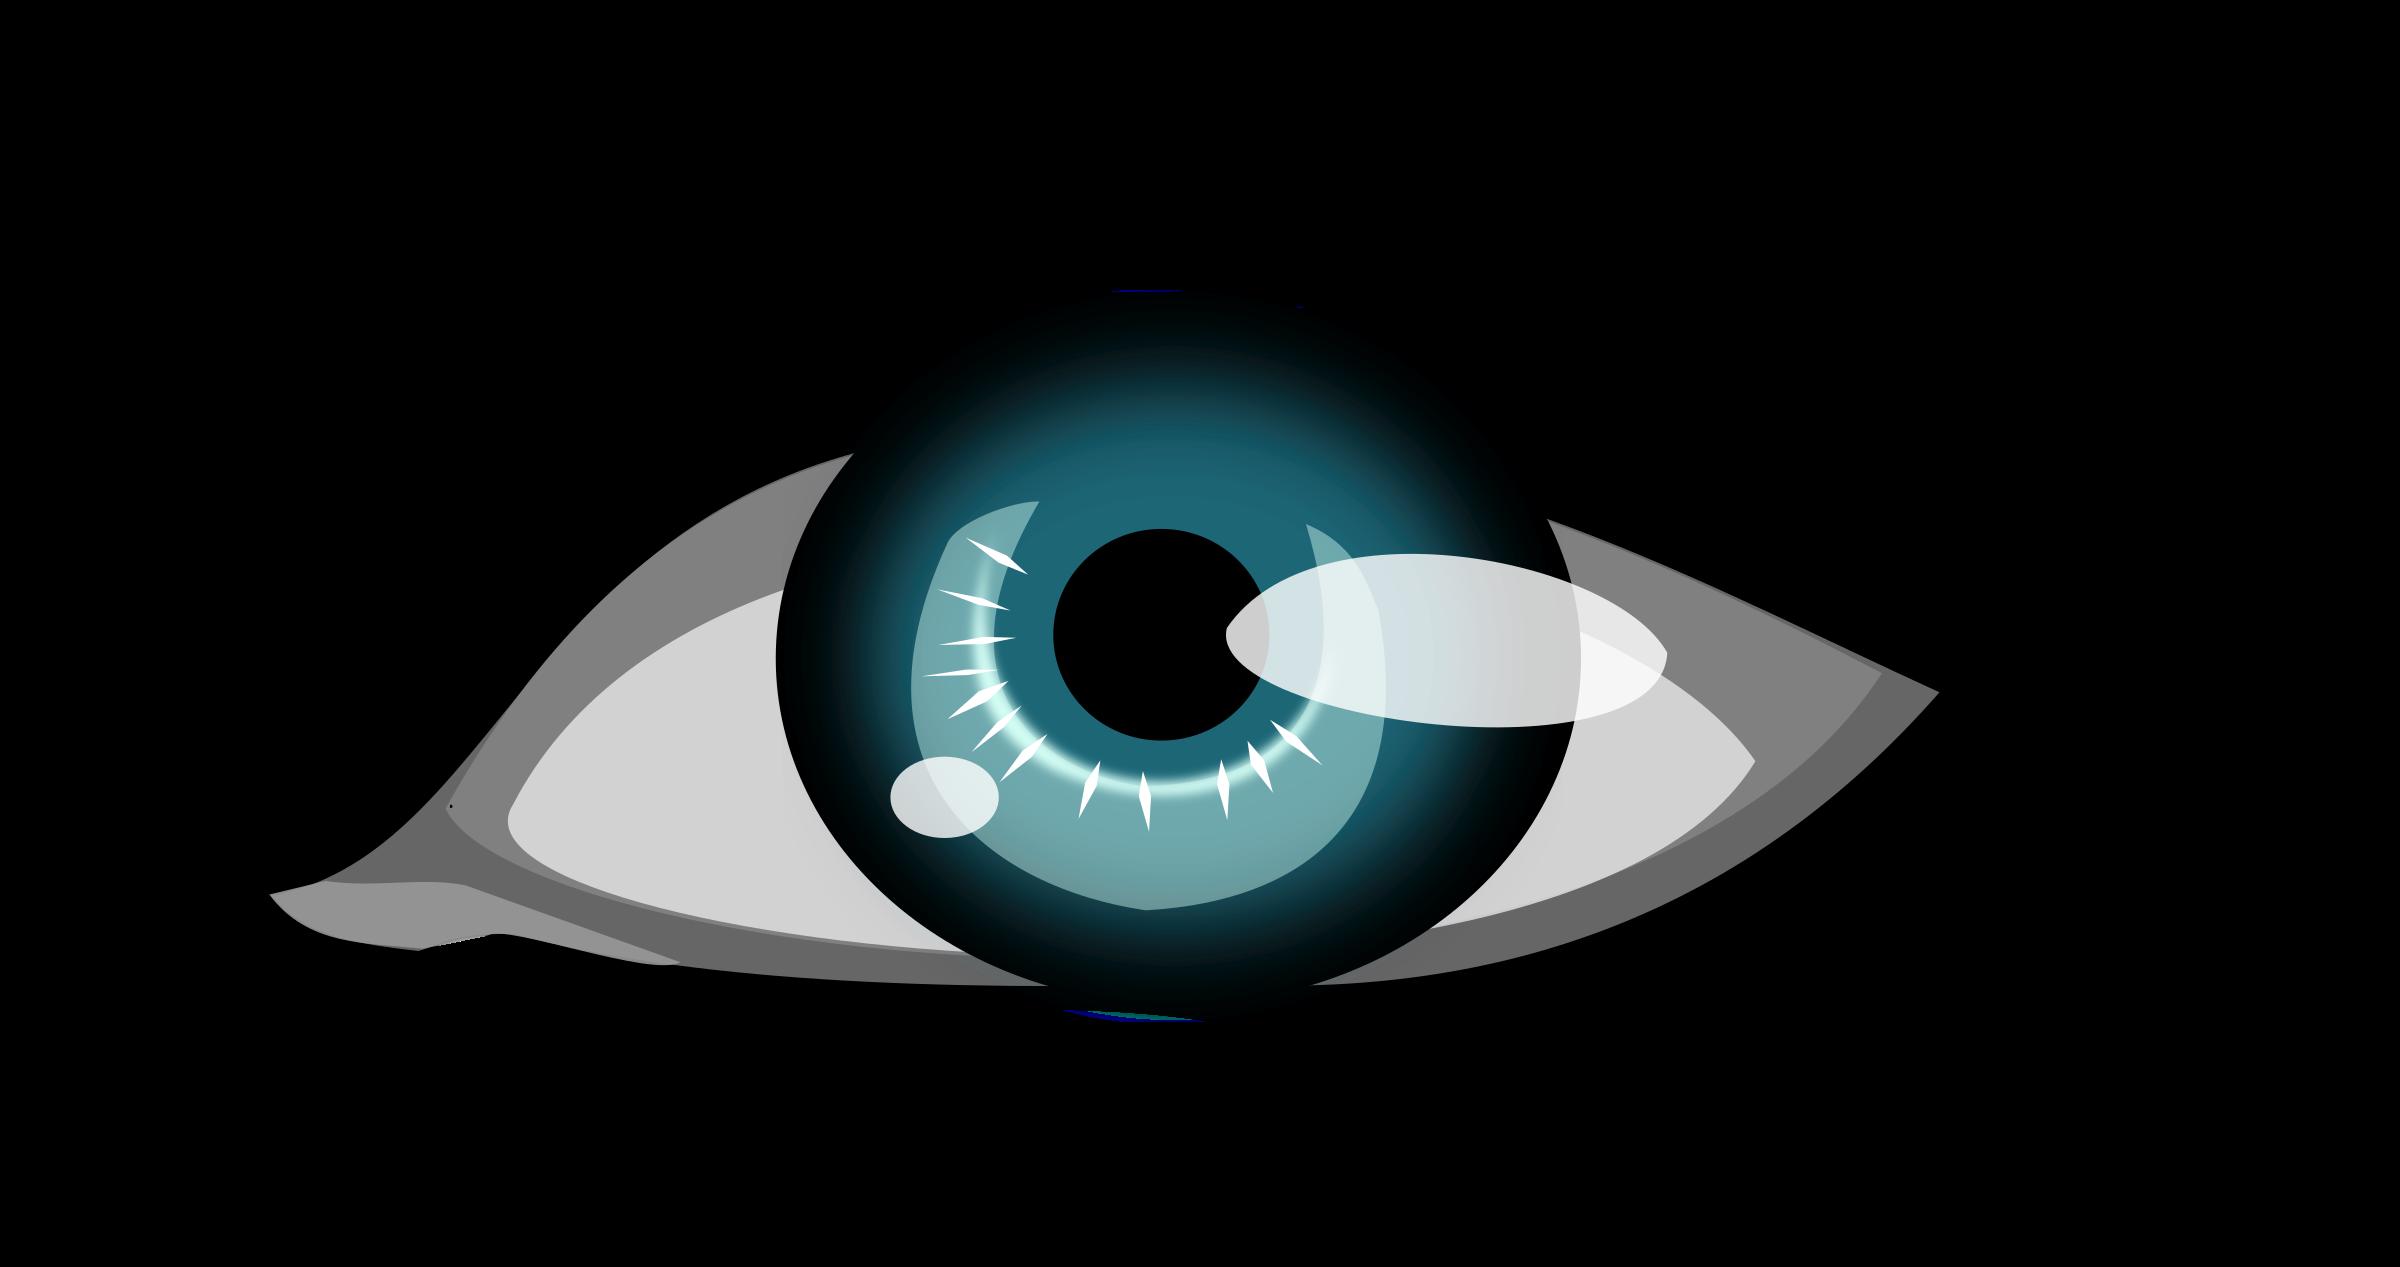 Eyelashes clipart clip art, Eyelashes clip art Transparent.